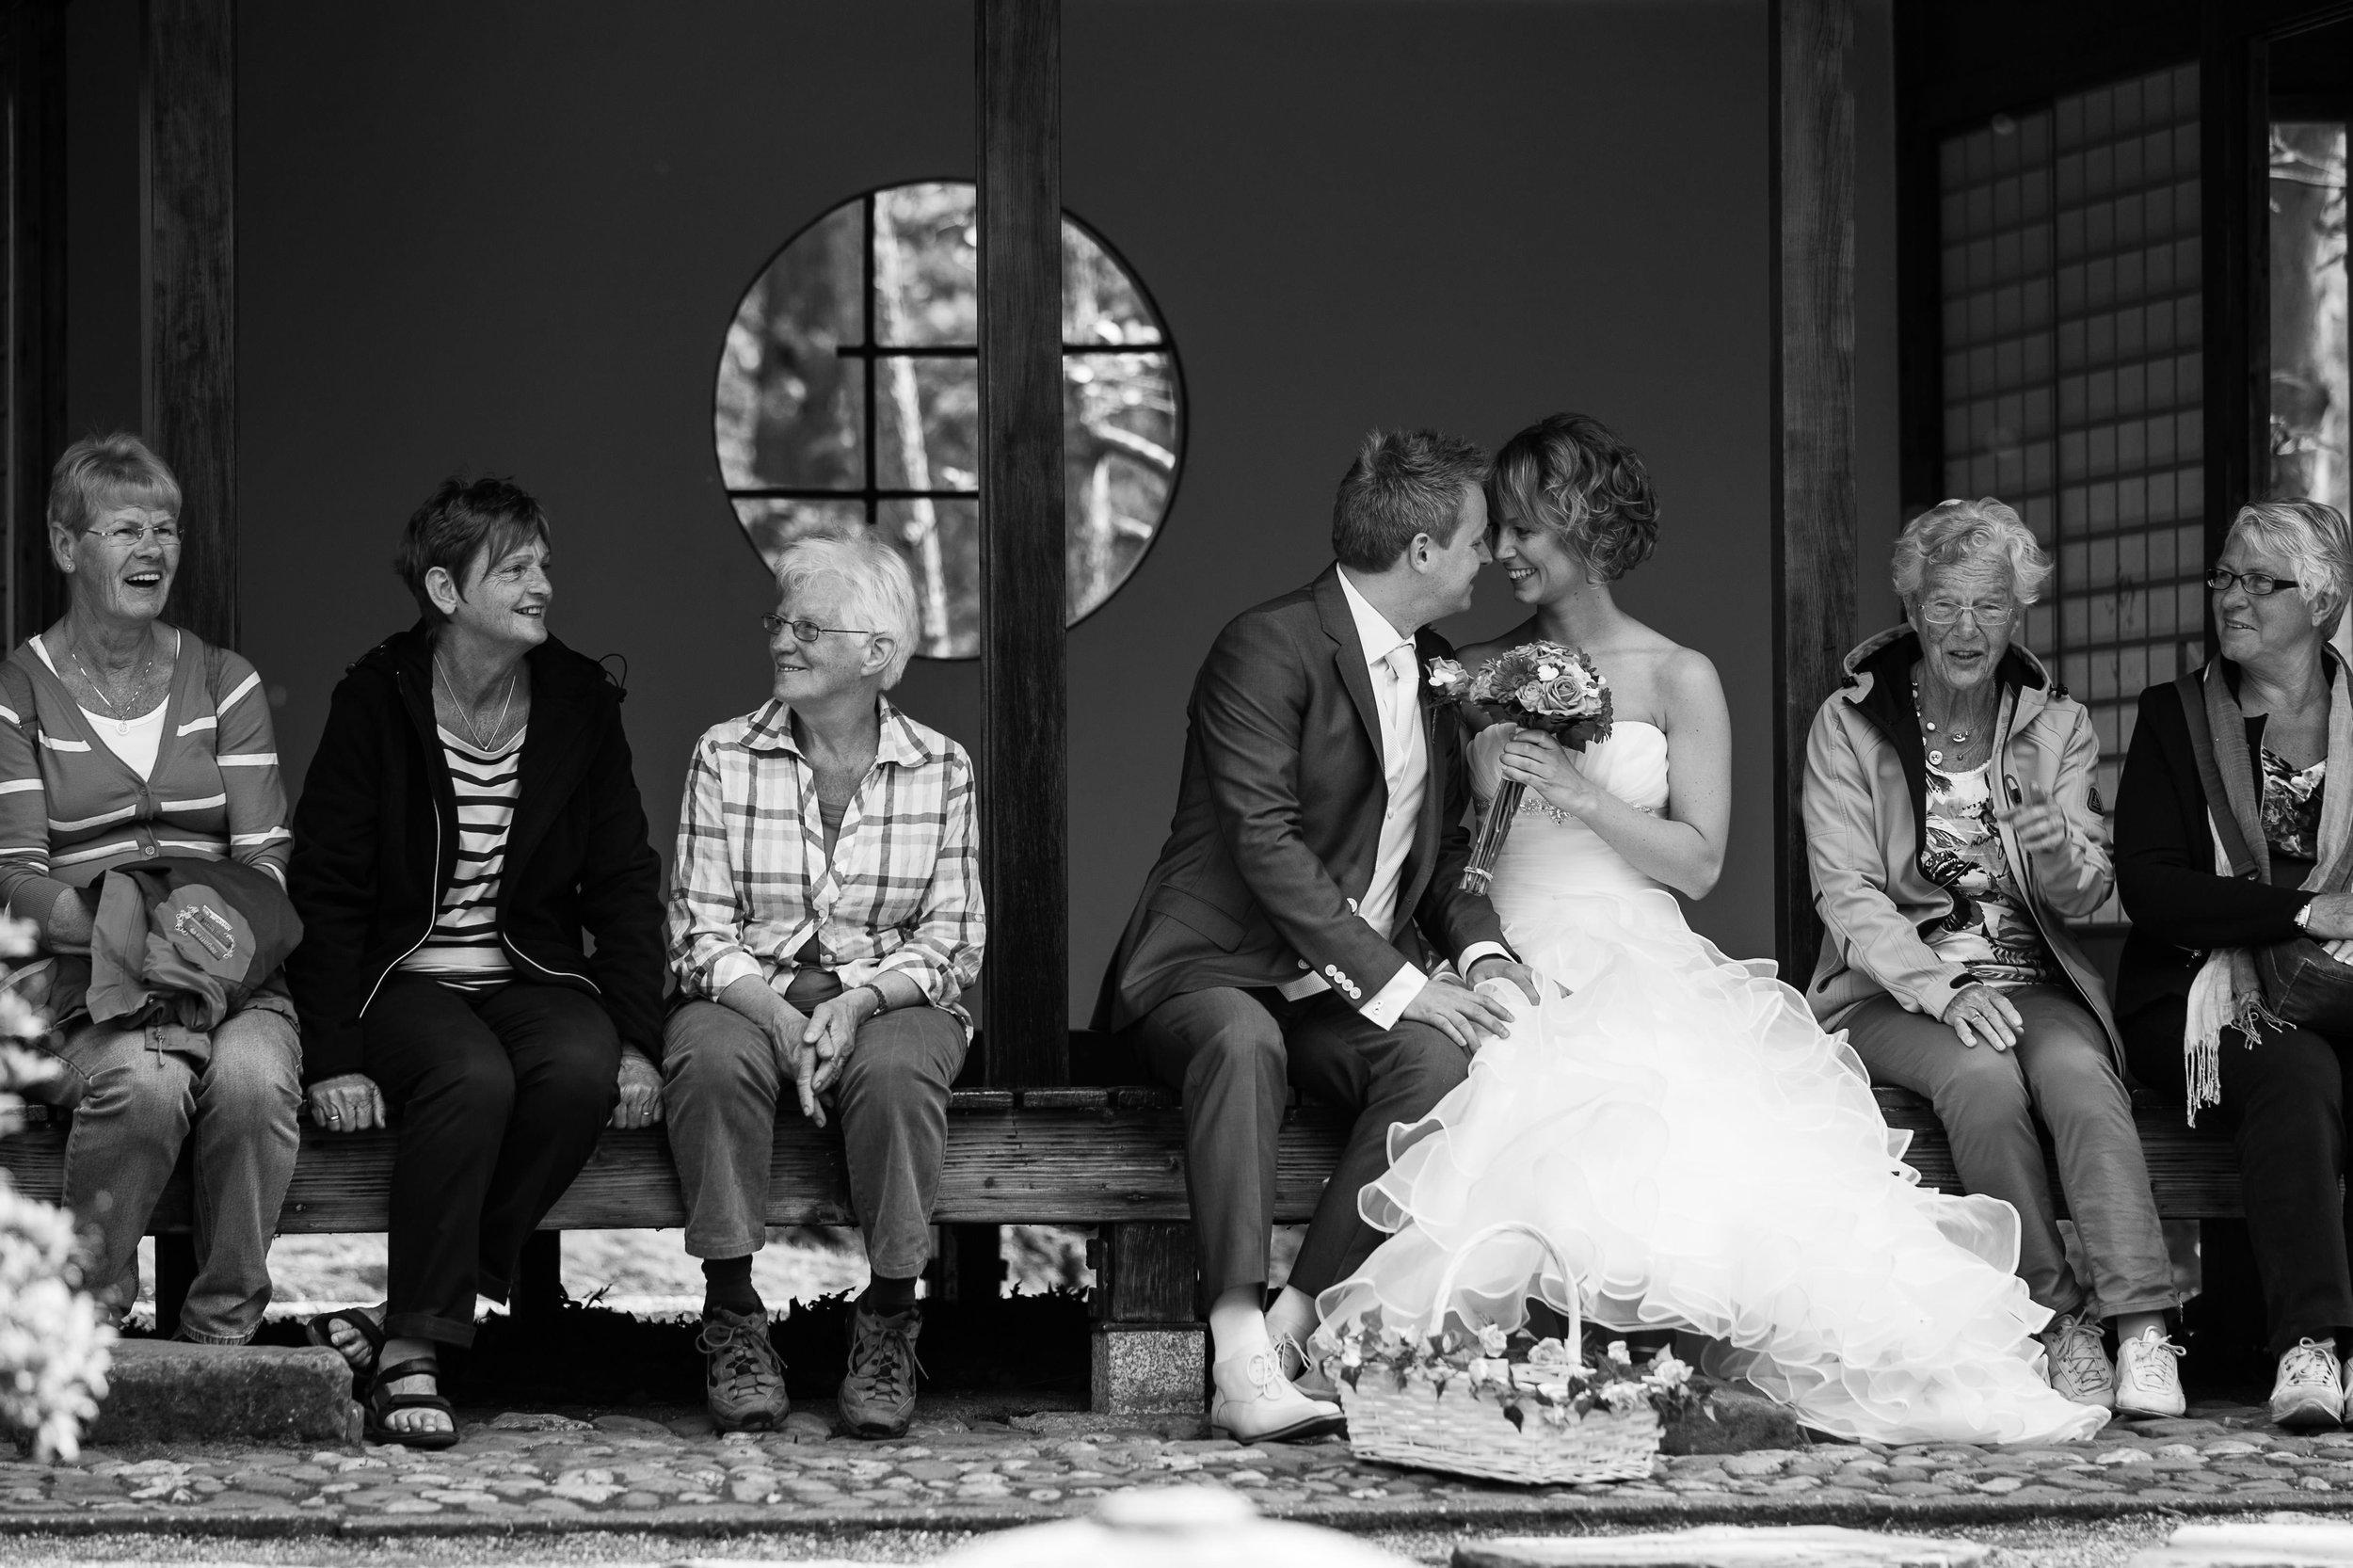 trouwshoot-bruidsfotografie-trouwfoto-feestfotografie-marcel en desiree-279.jpg